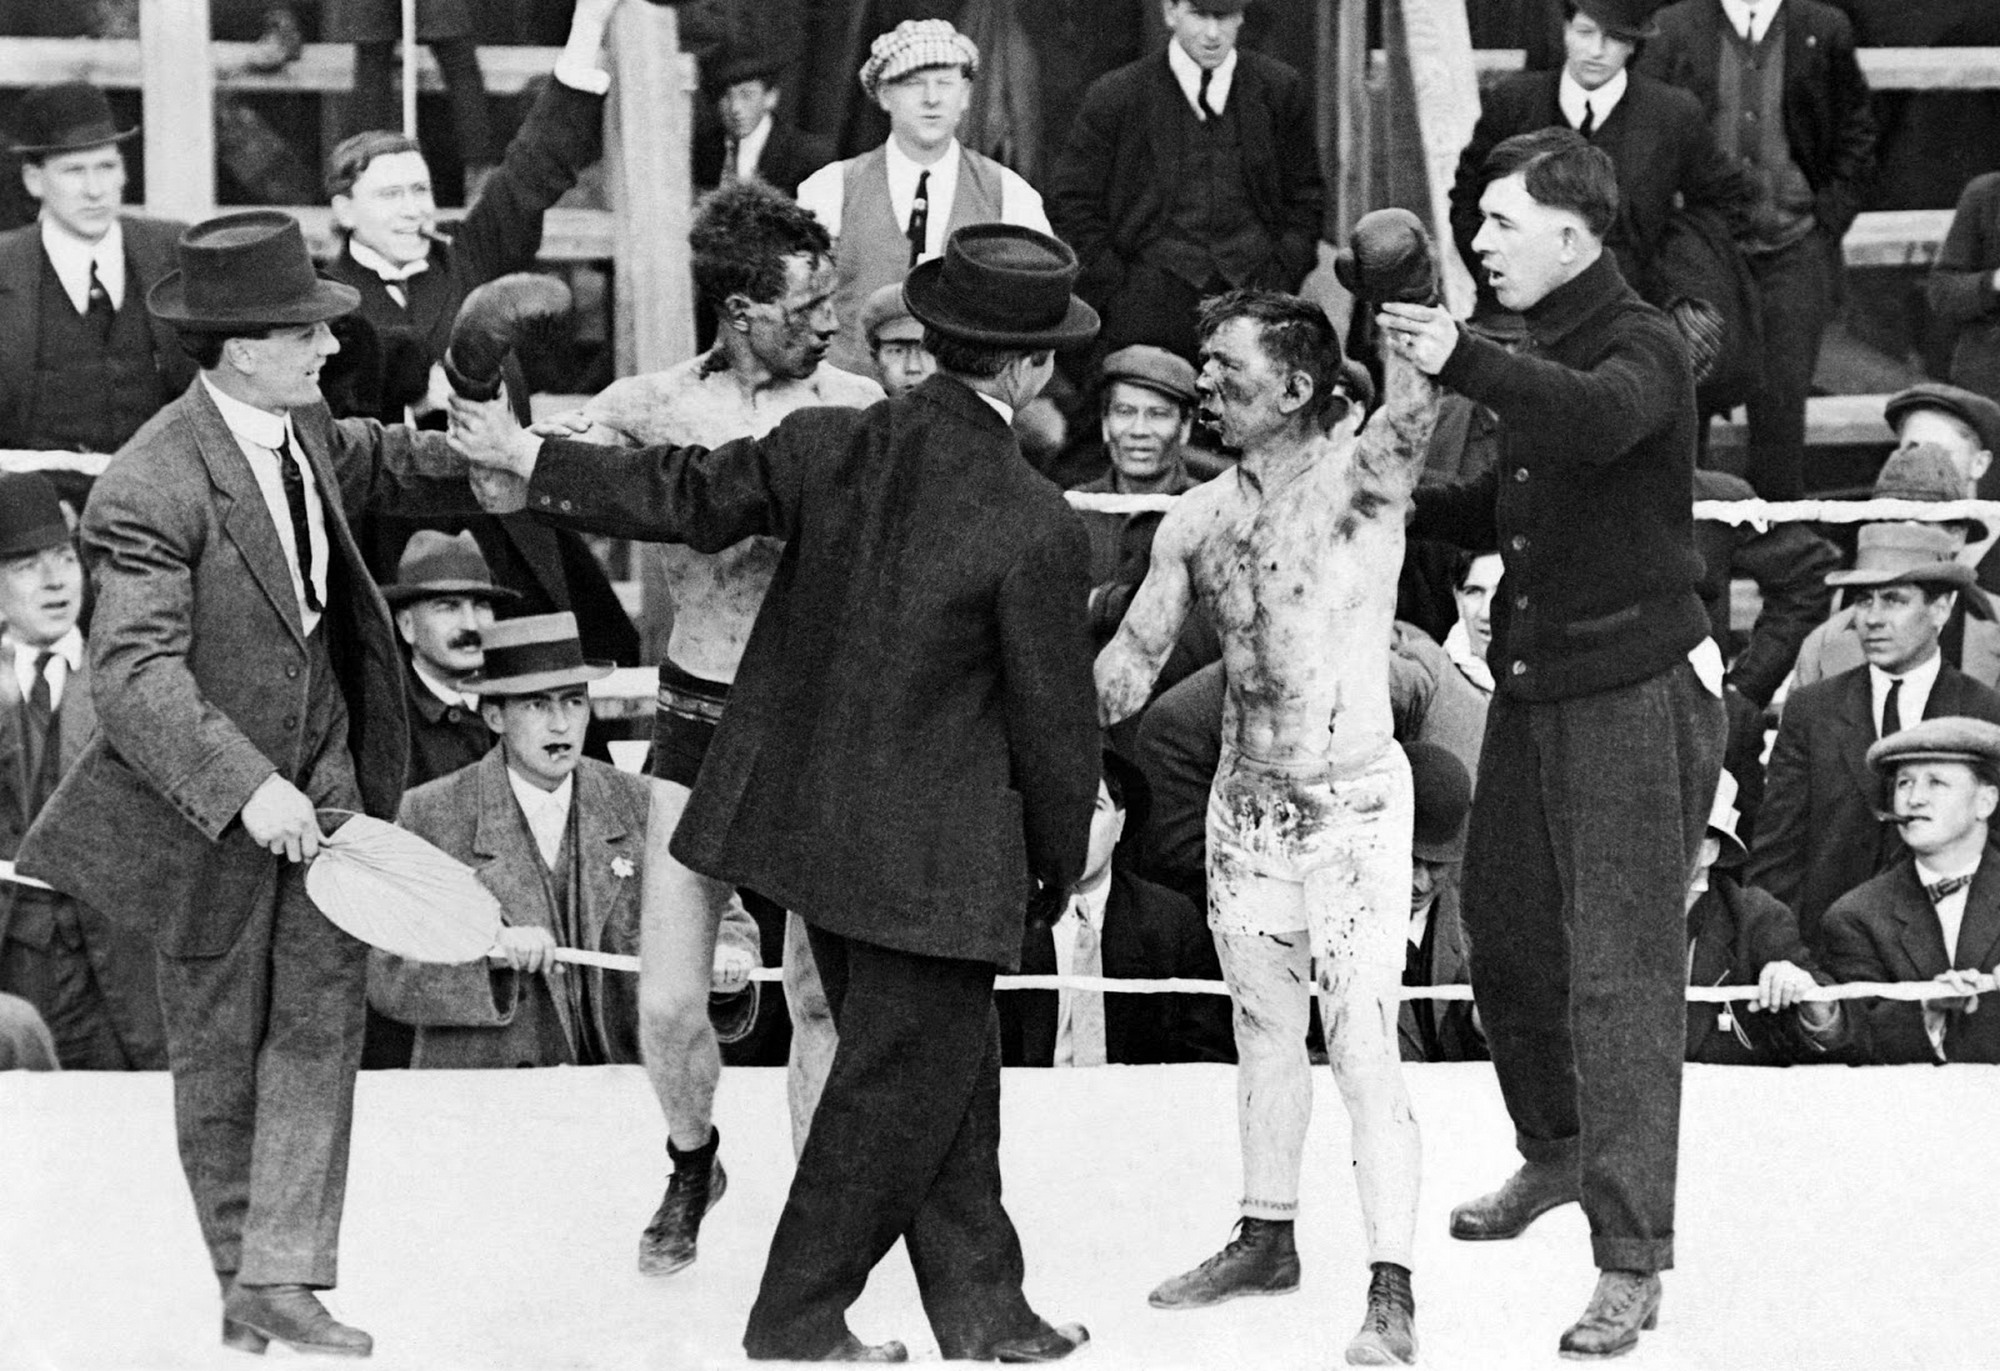 1913. Roy Campbell vs. Dick Hyland. Micsoda meccs lehetett....jpg